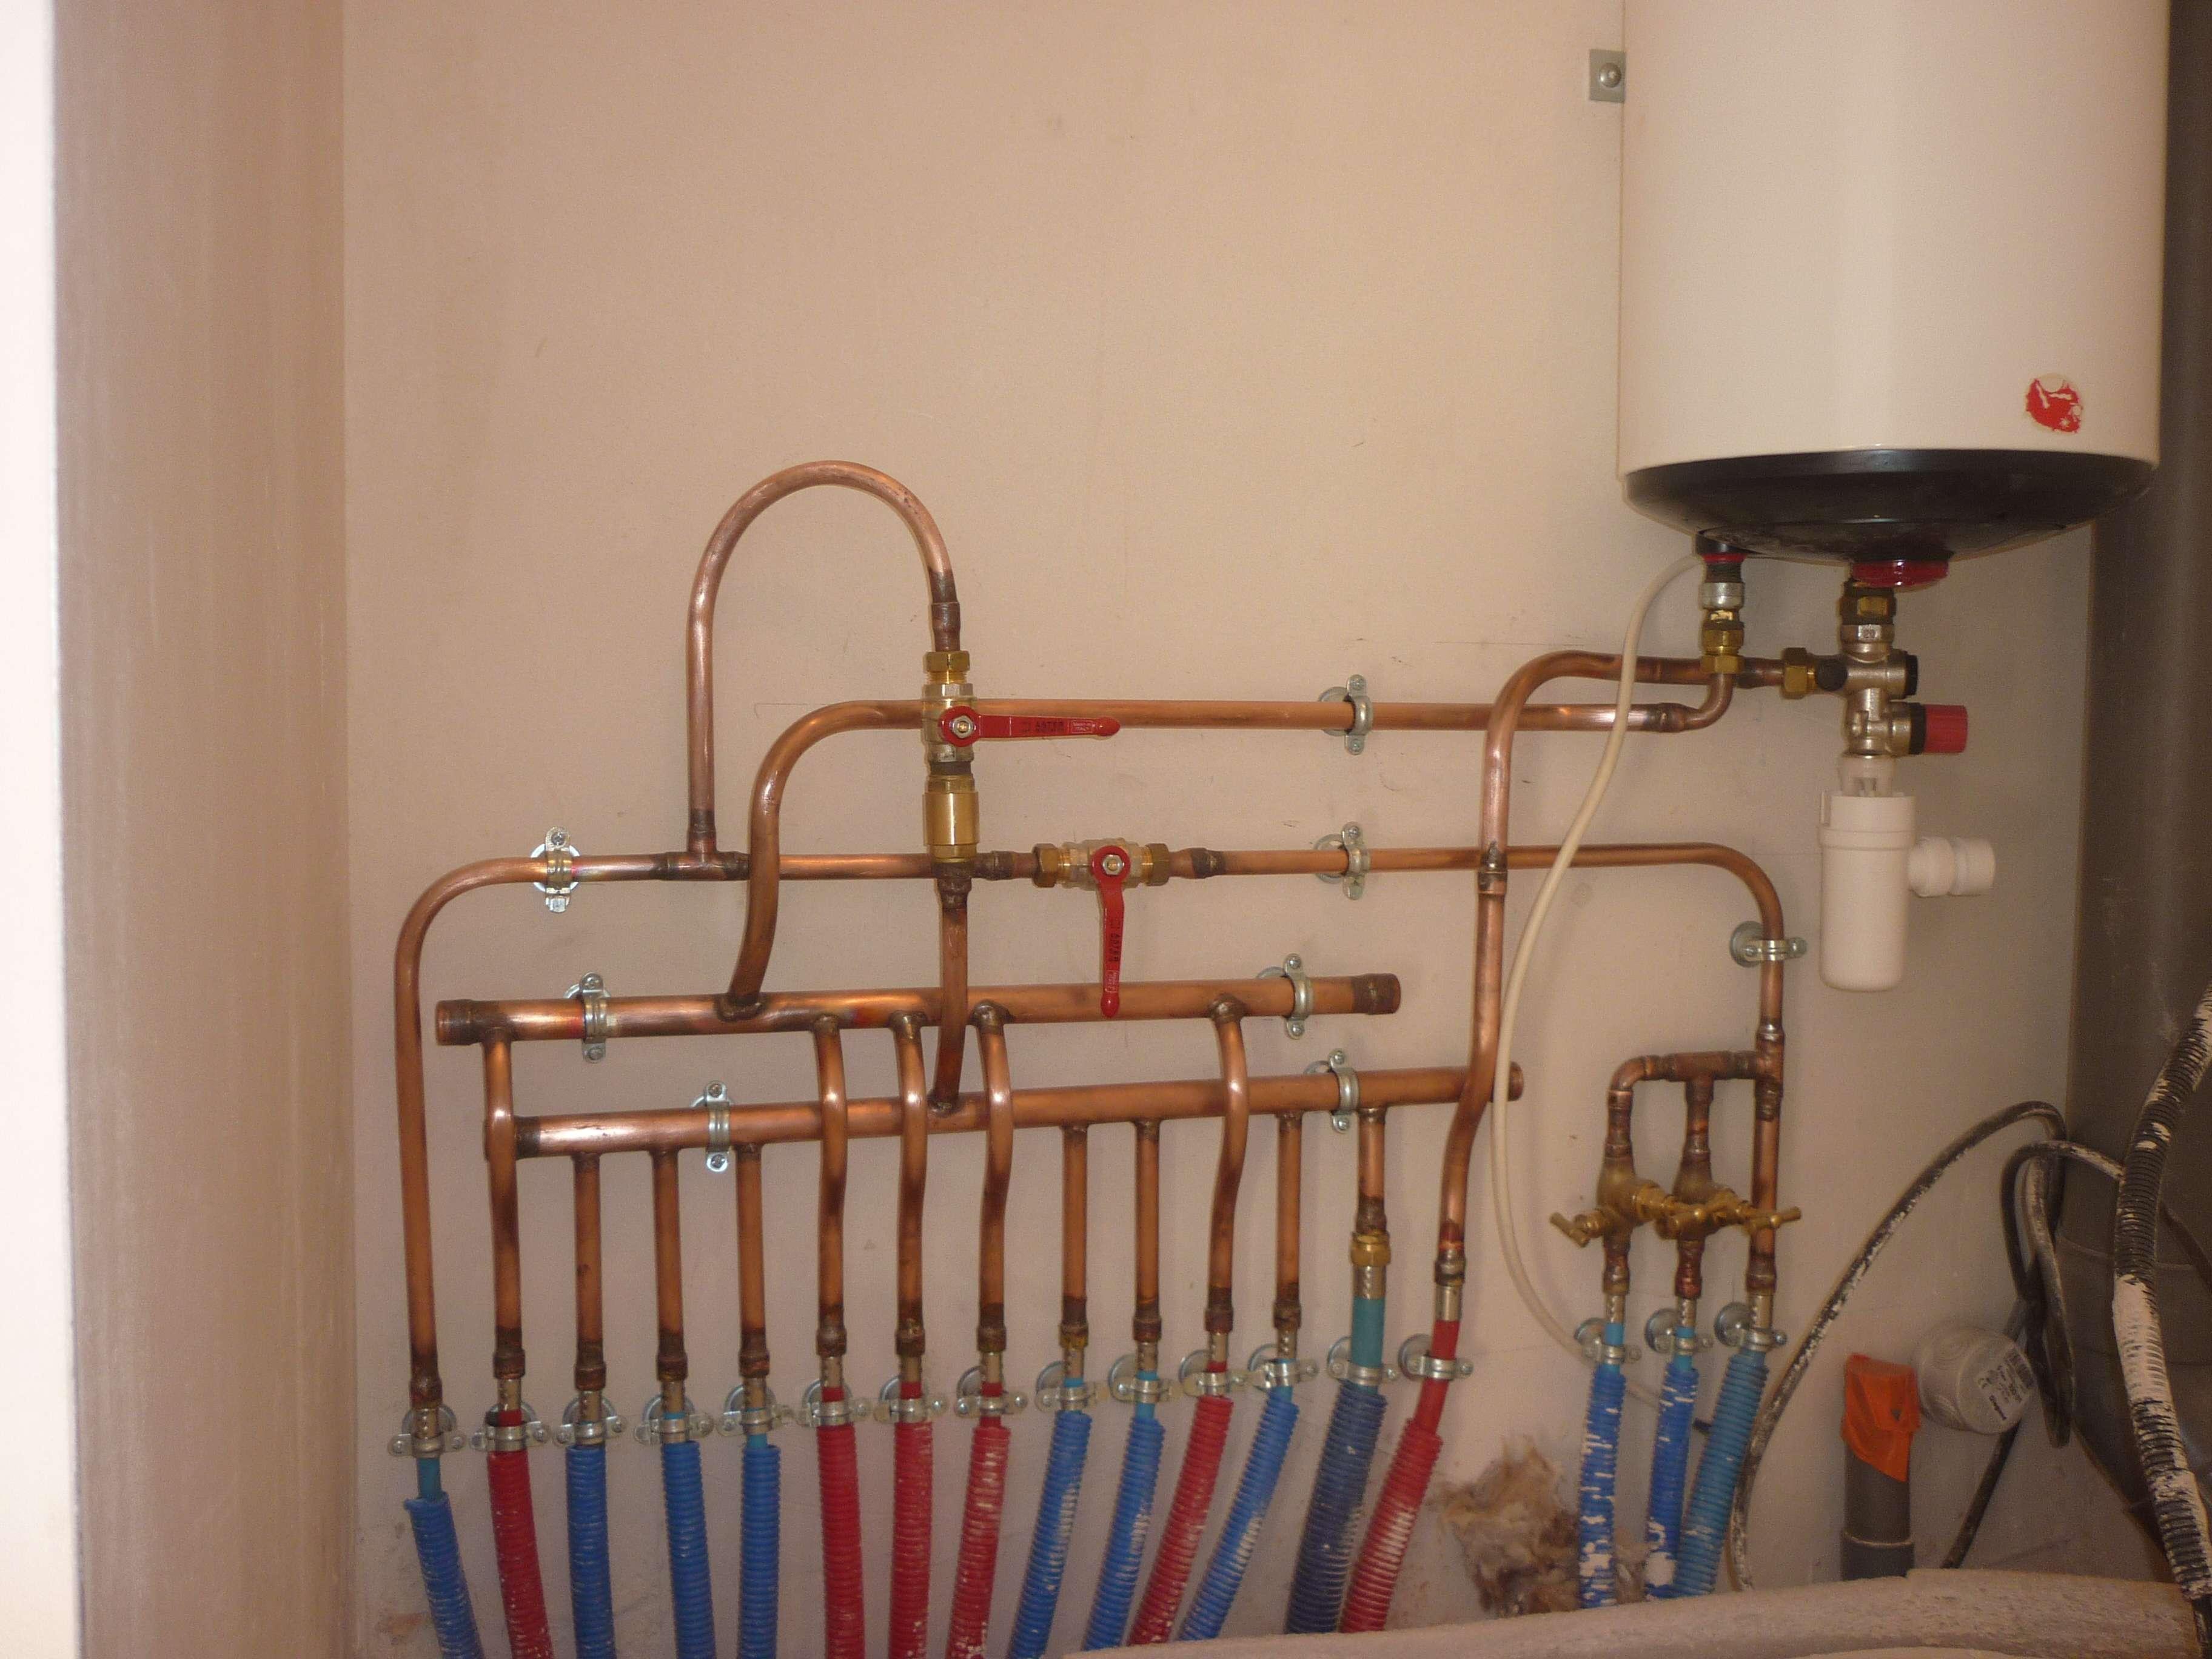 Installation plomberie, plombier, plomberie, Robinetterie, lavabo